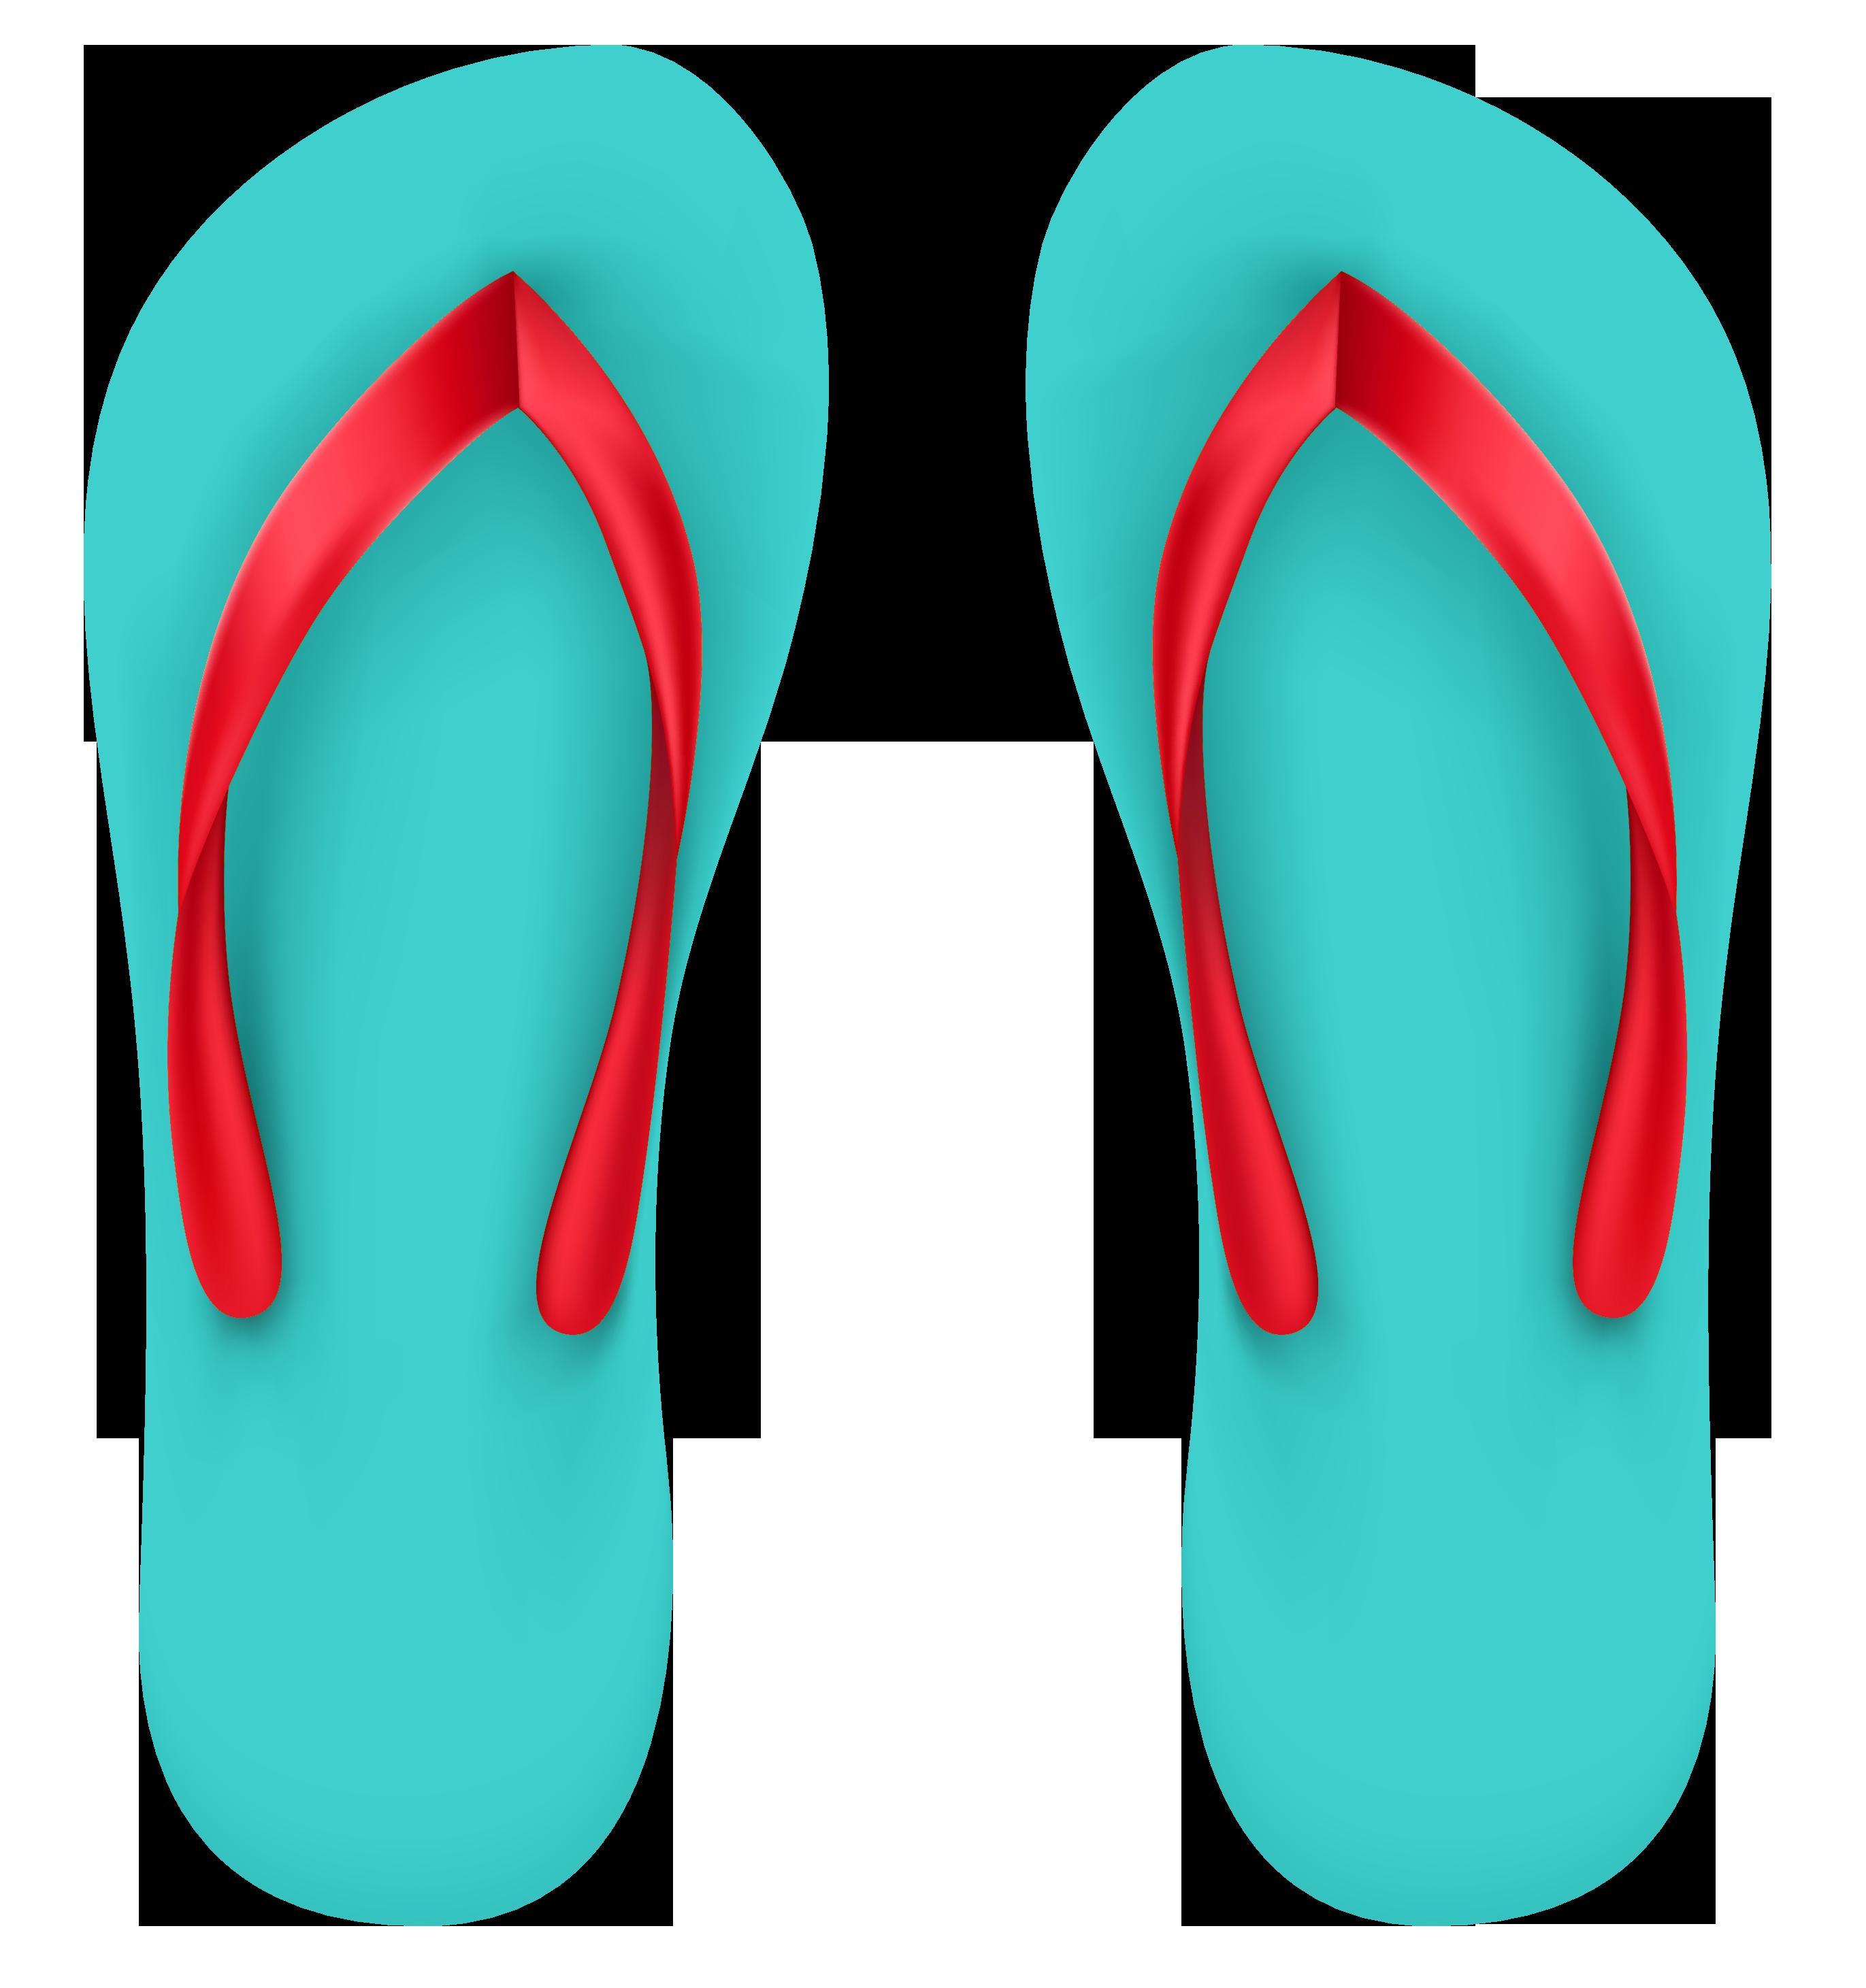 dba67ac42b5a Download Free Beach Sandal ICON favicon